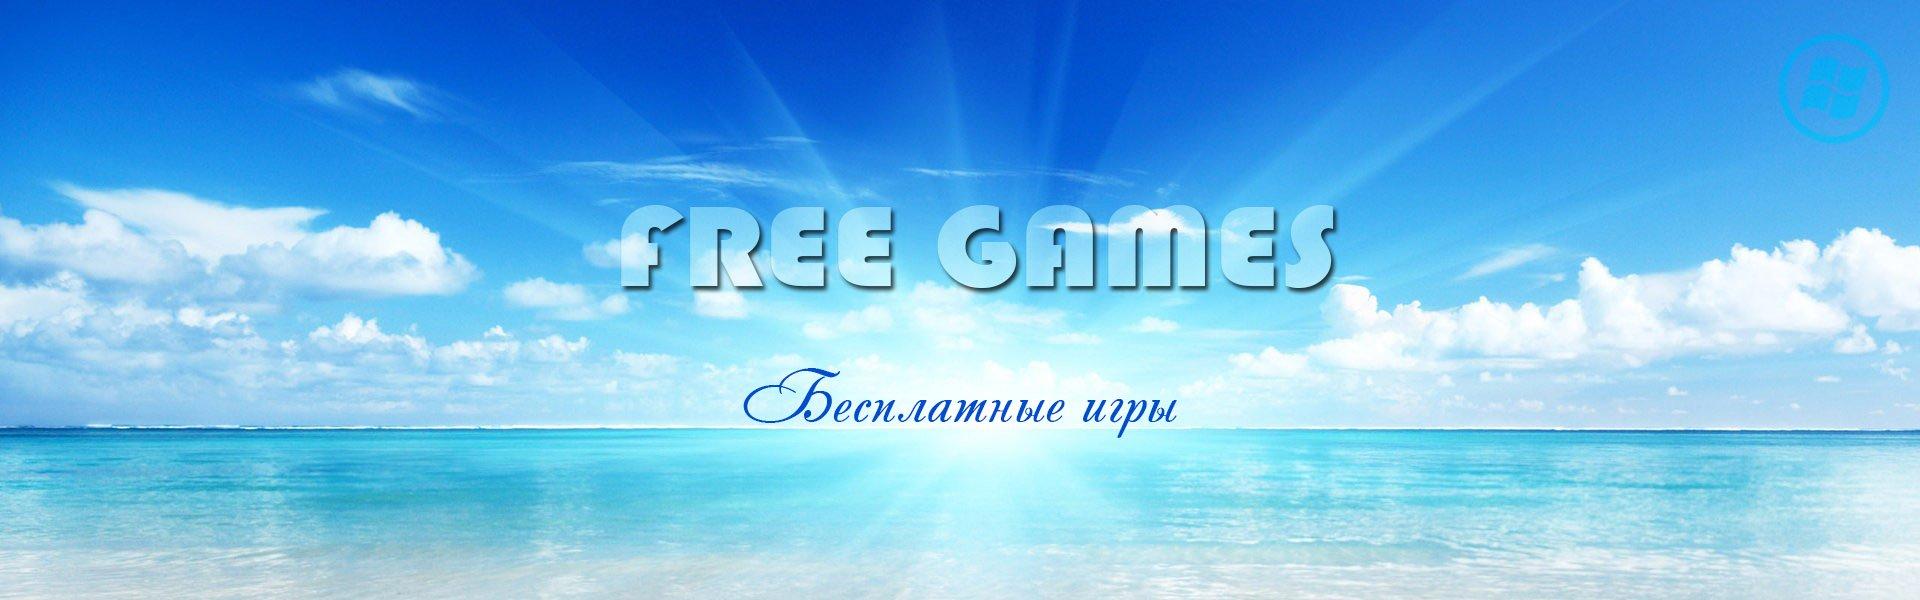 image_free_allkey